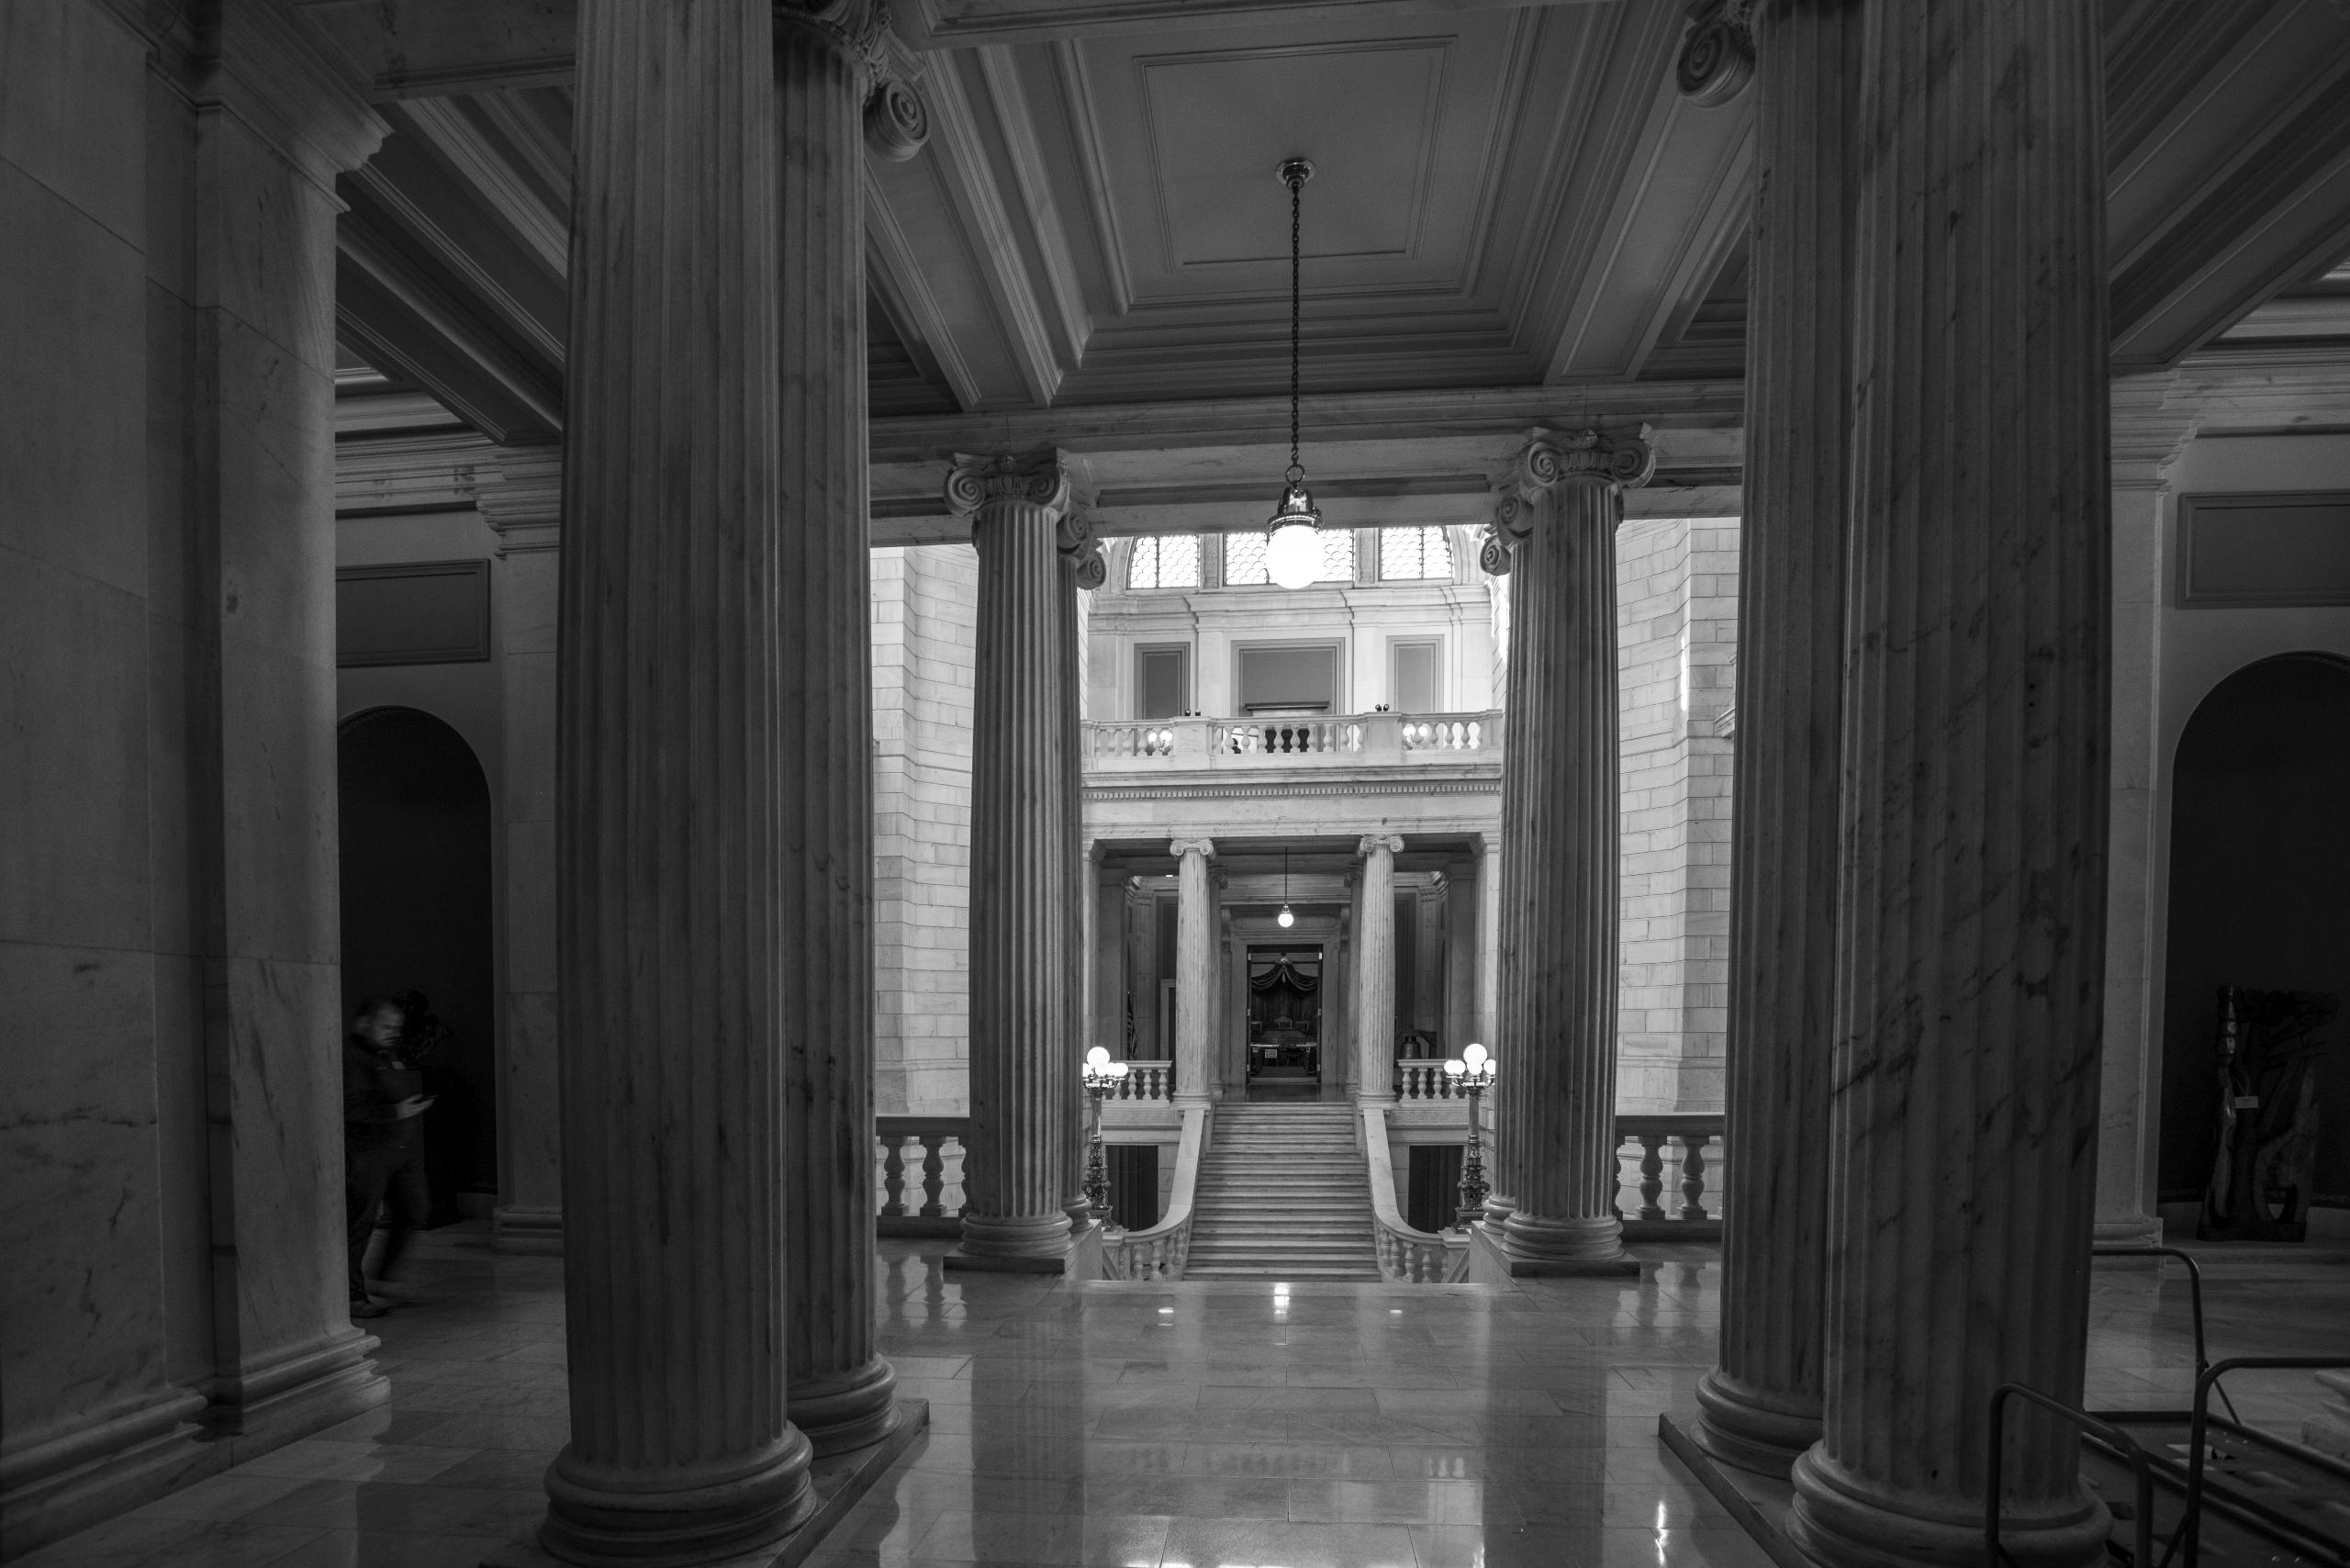 Rhode Island building - capitol - usnrmustang | ello